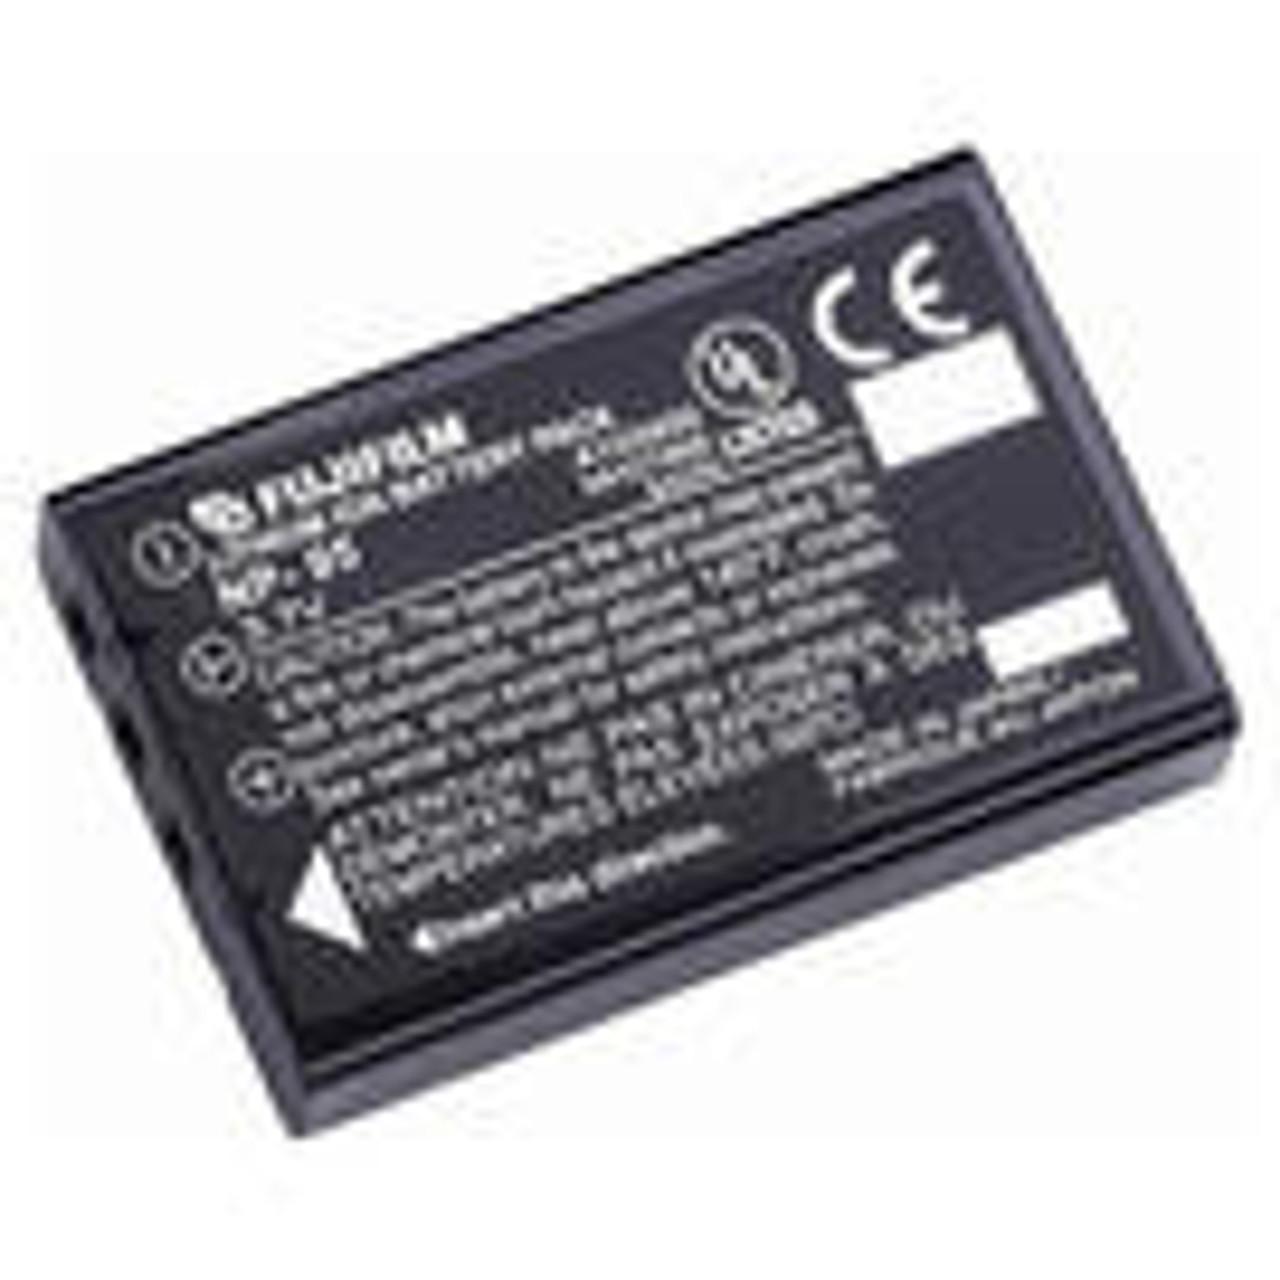 Fujifilm NP-95 Battery Pack